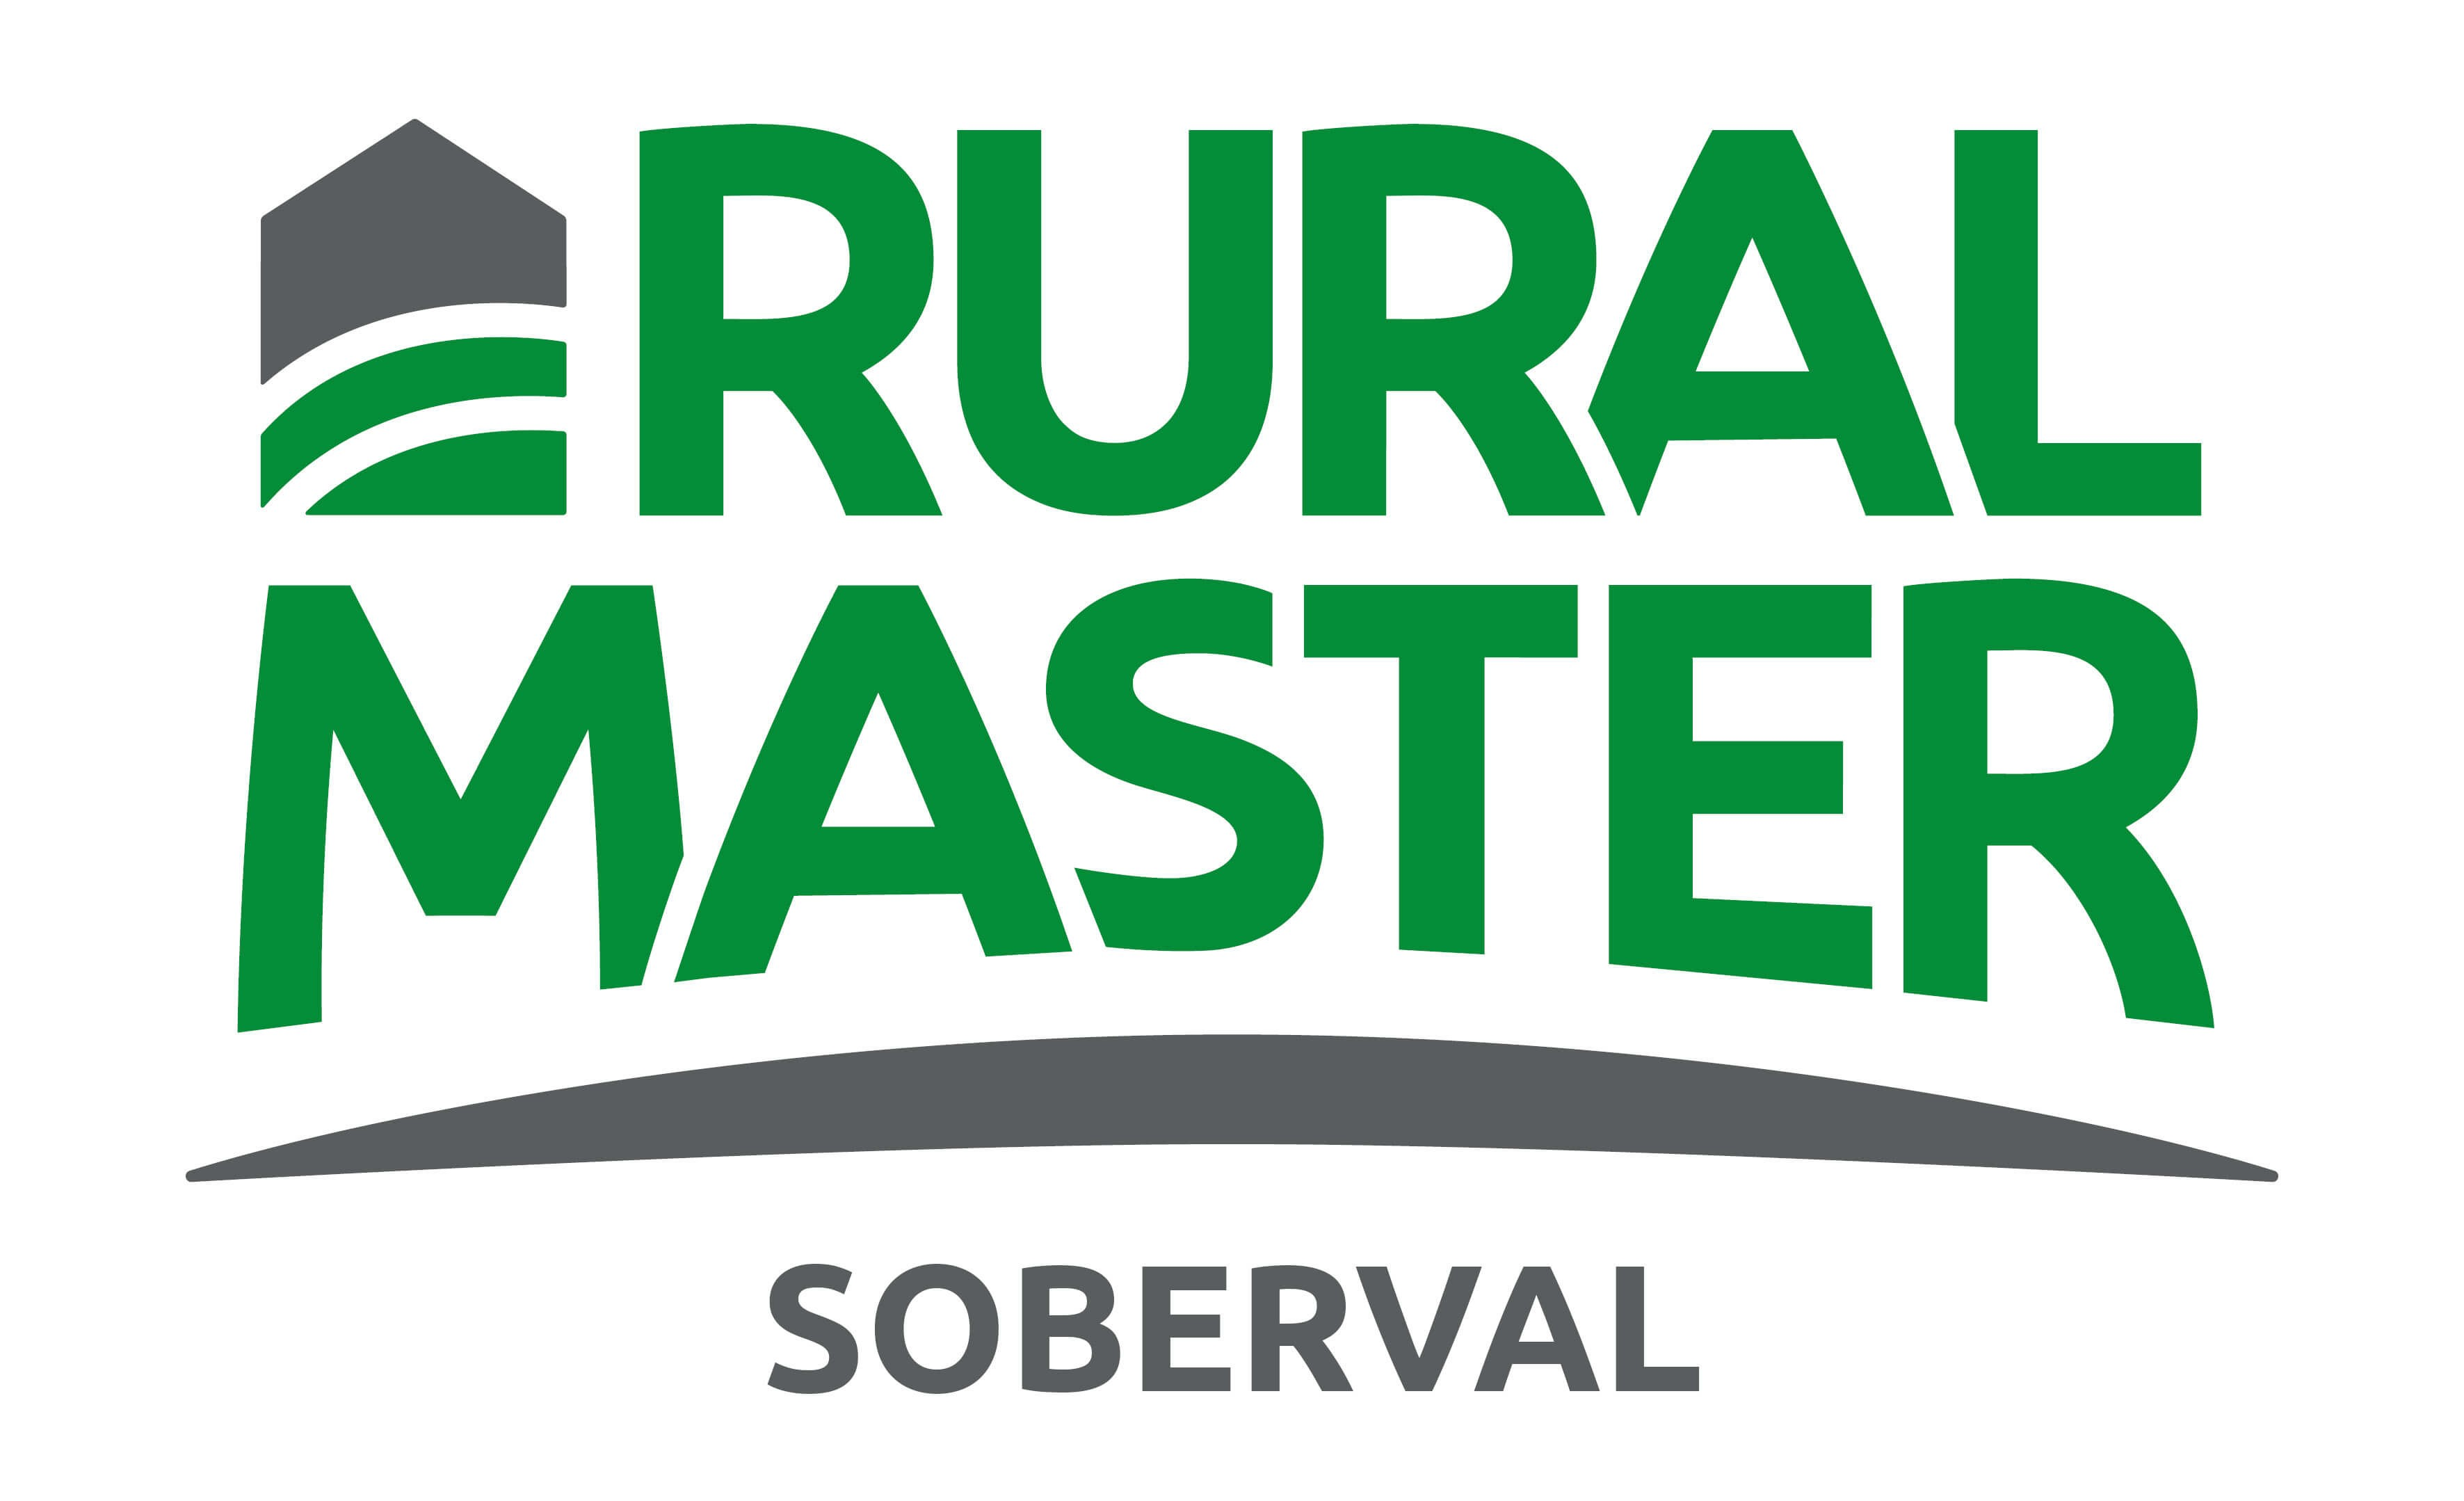 Rural Master BRETEUIL - SOBERVAL